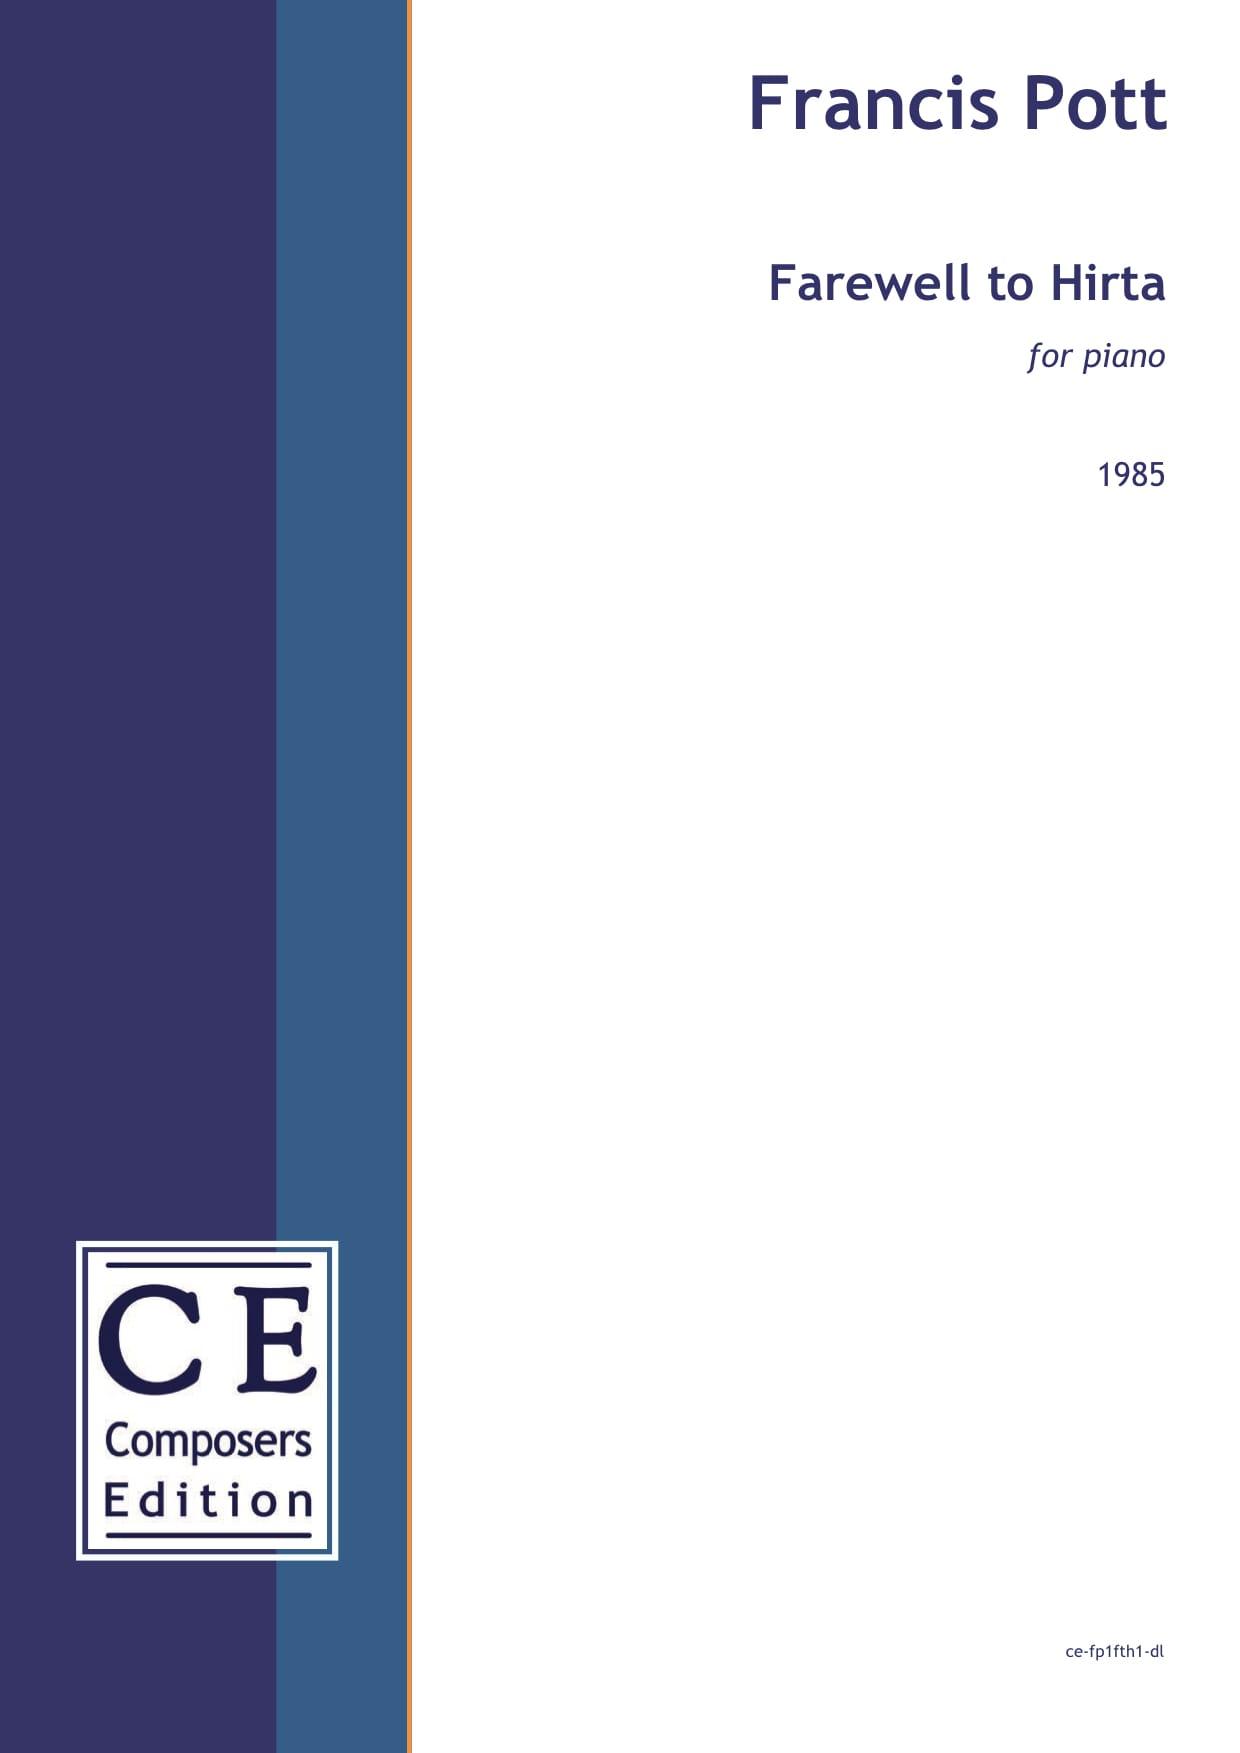 Francis Pott: Farewell to Hirta for piano